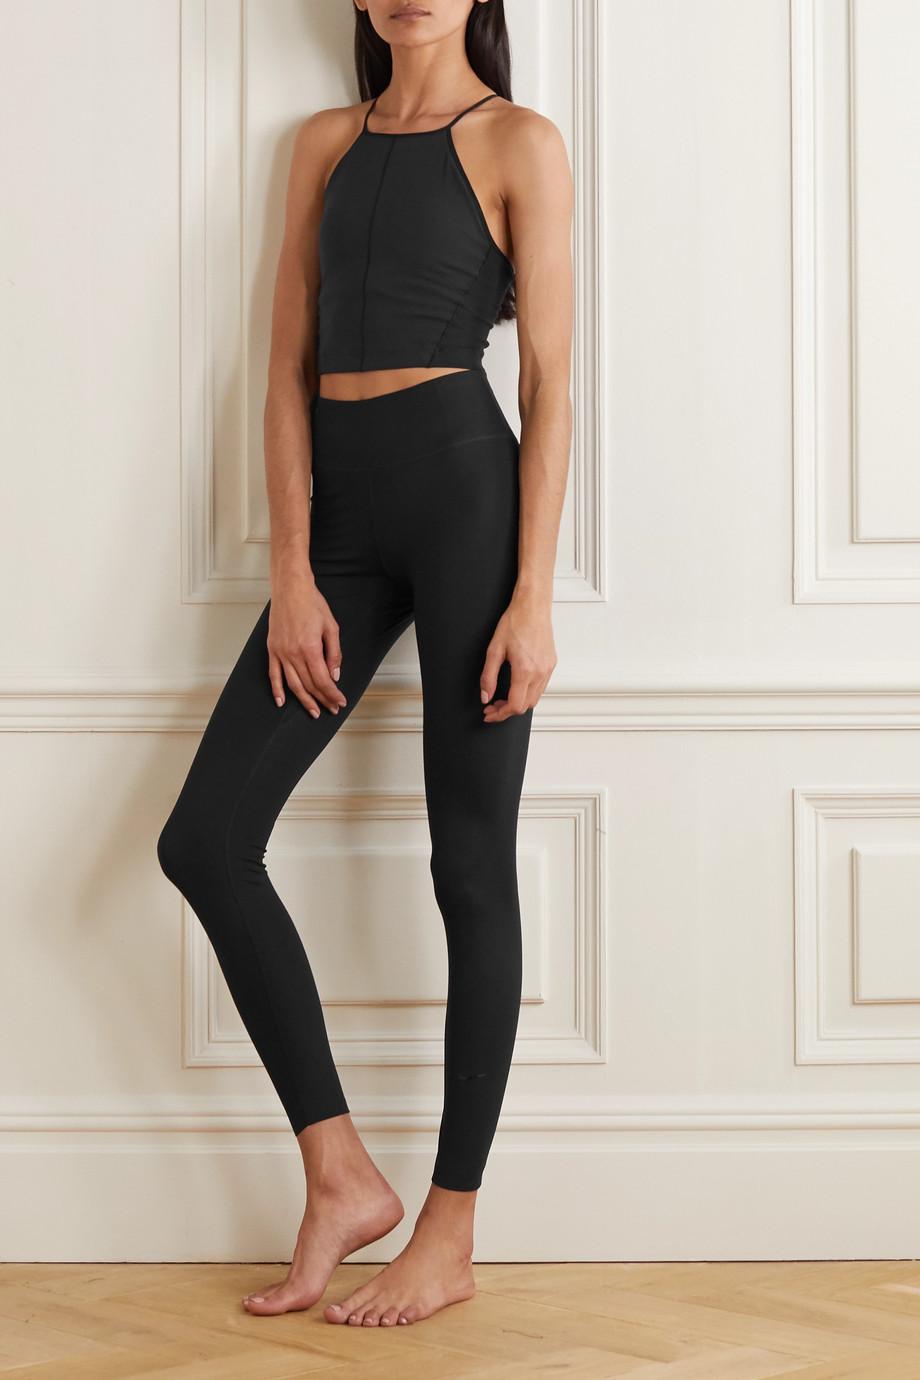 Nike Yoga Infinalon verkürztes Oberteil aus Stretch-Jersey